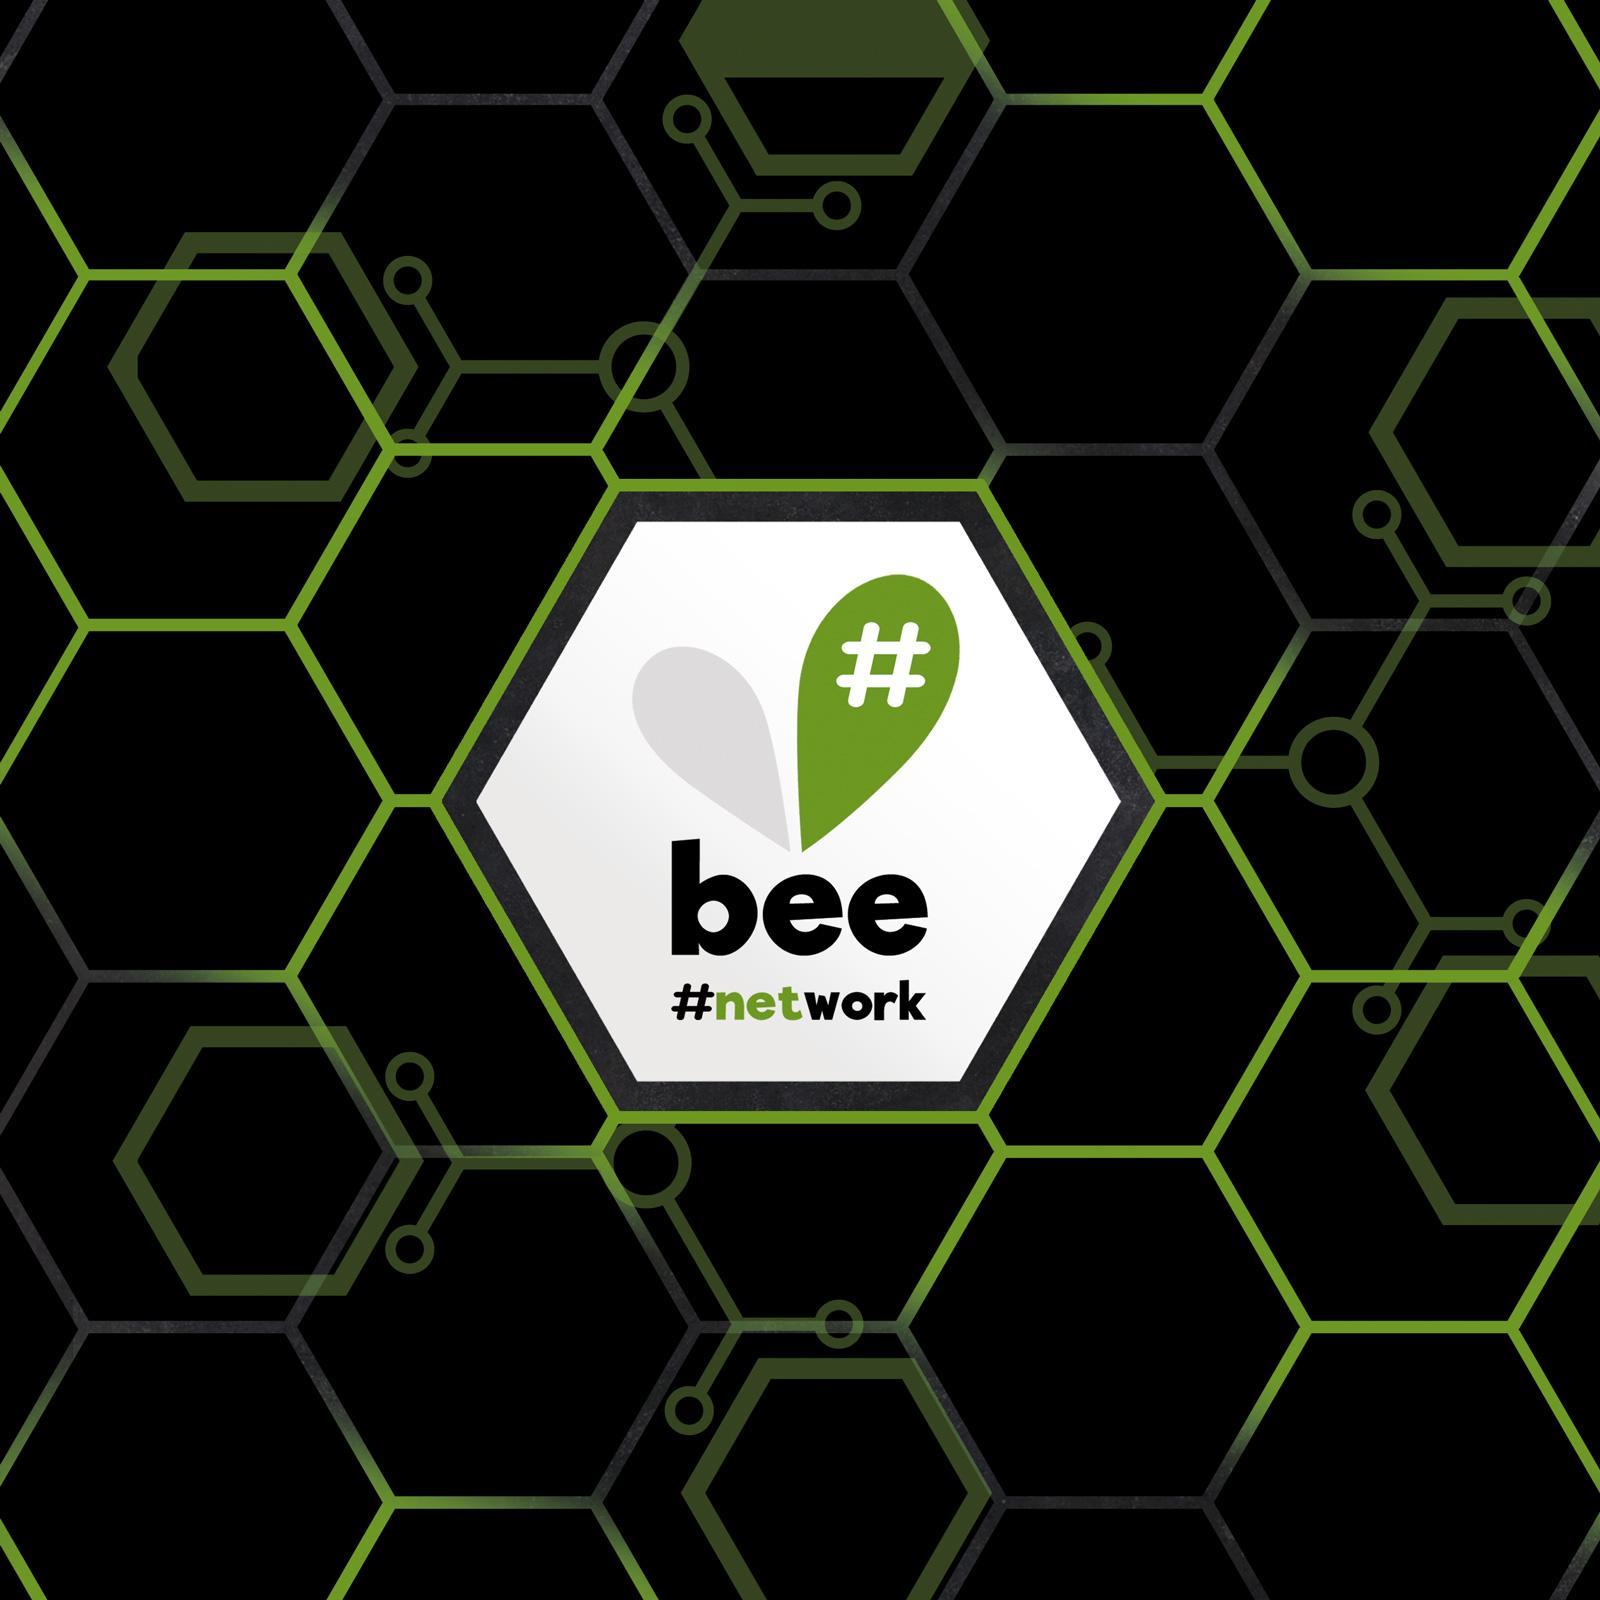 Team bee-my.world